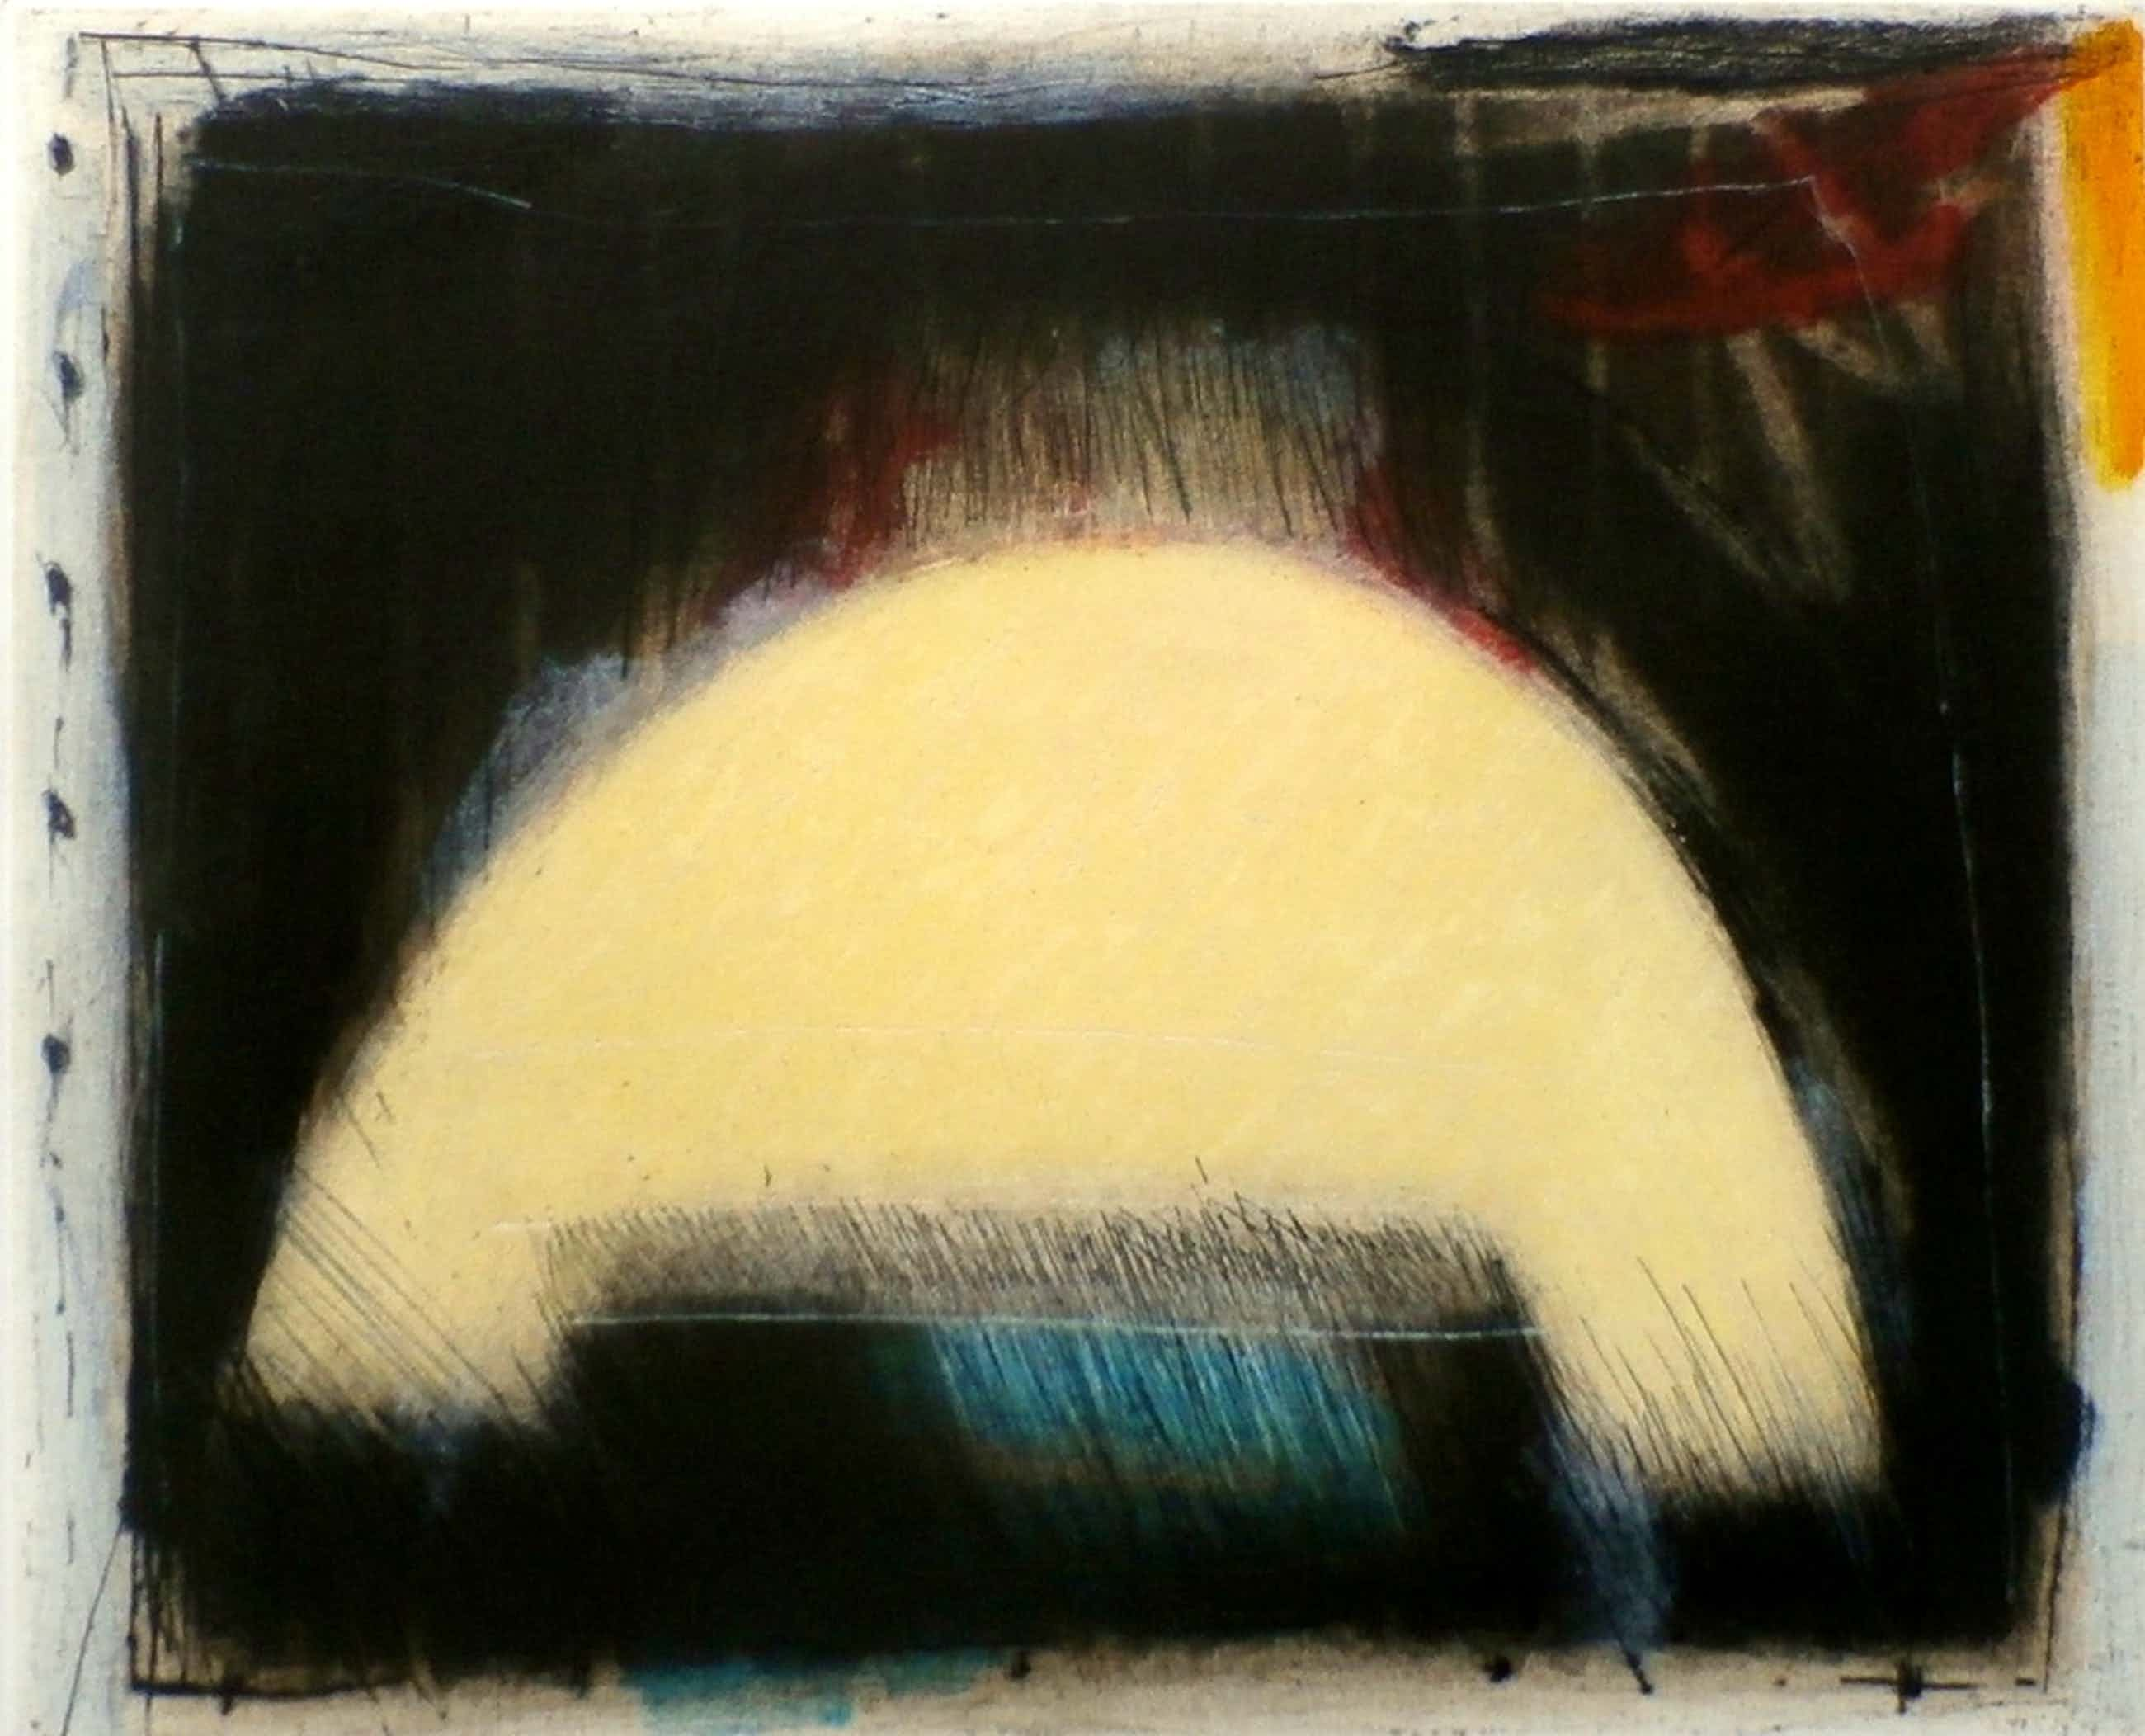 Kees Slegt - abstracte ets - 1987 kopen? Bied vanaf 35!